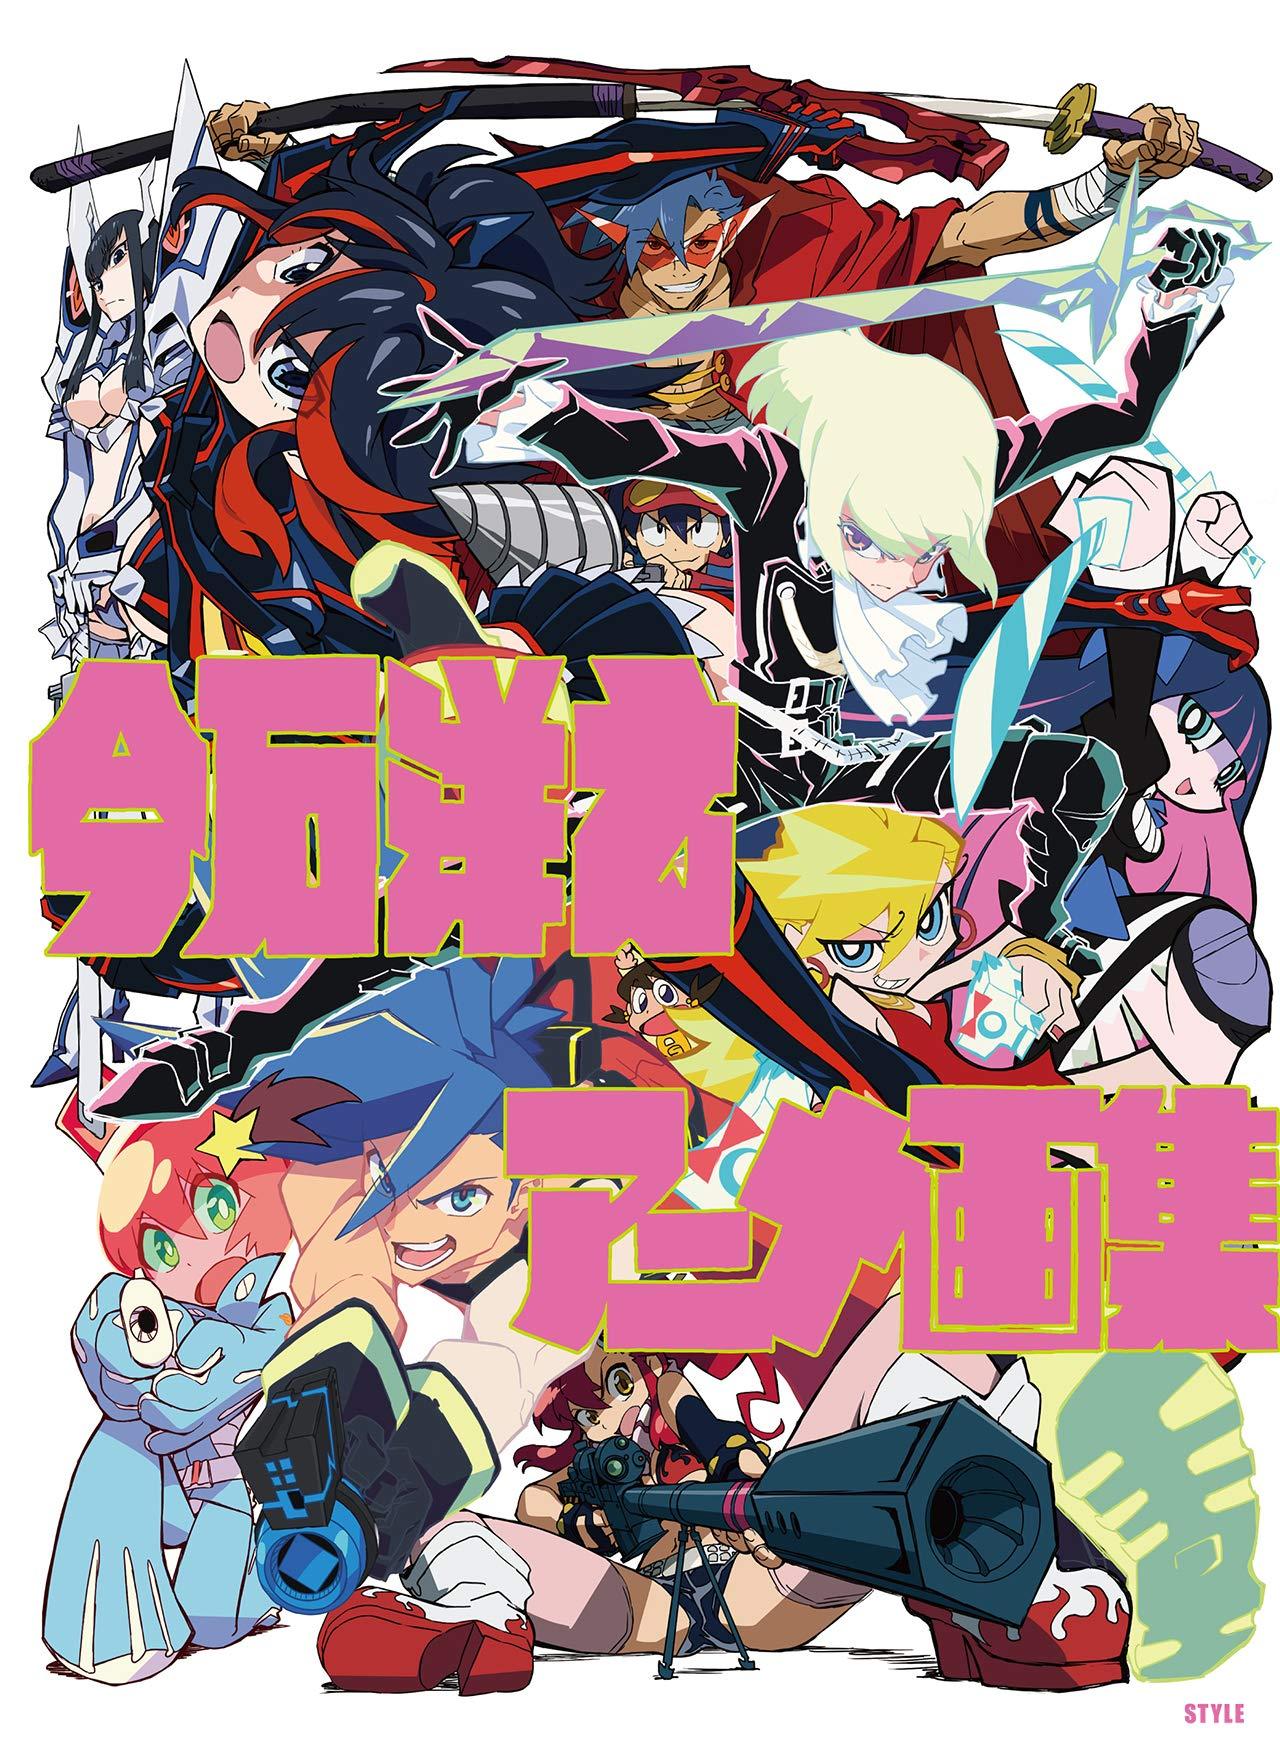 Hiroyuki Imaishi Anime Artworks